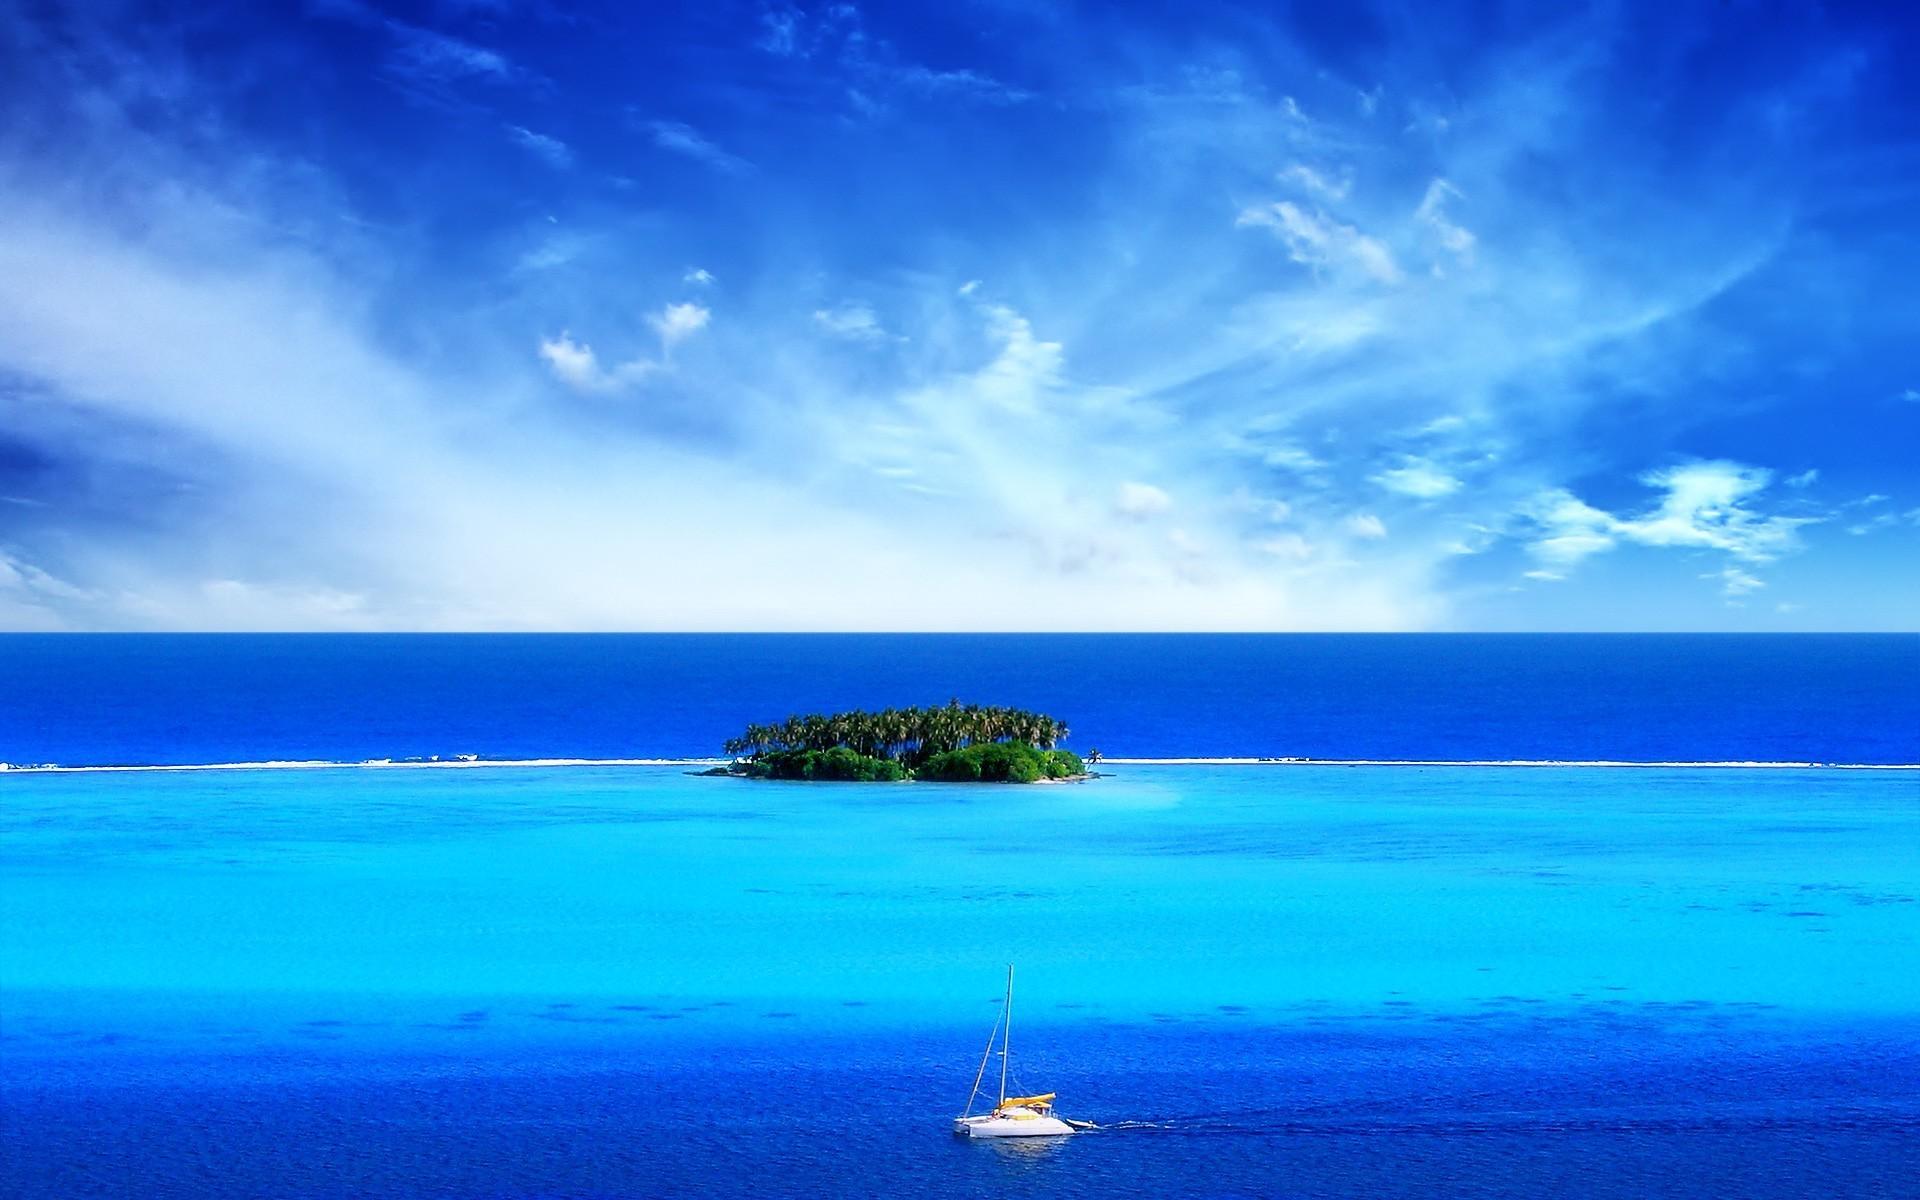 Sailing around the tropical island wallpaper   1034041 1920x1200